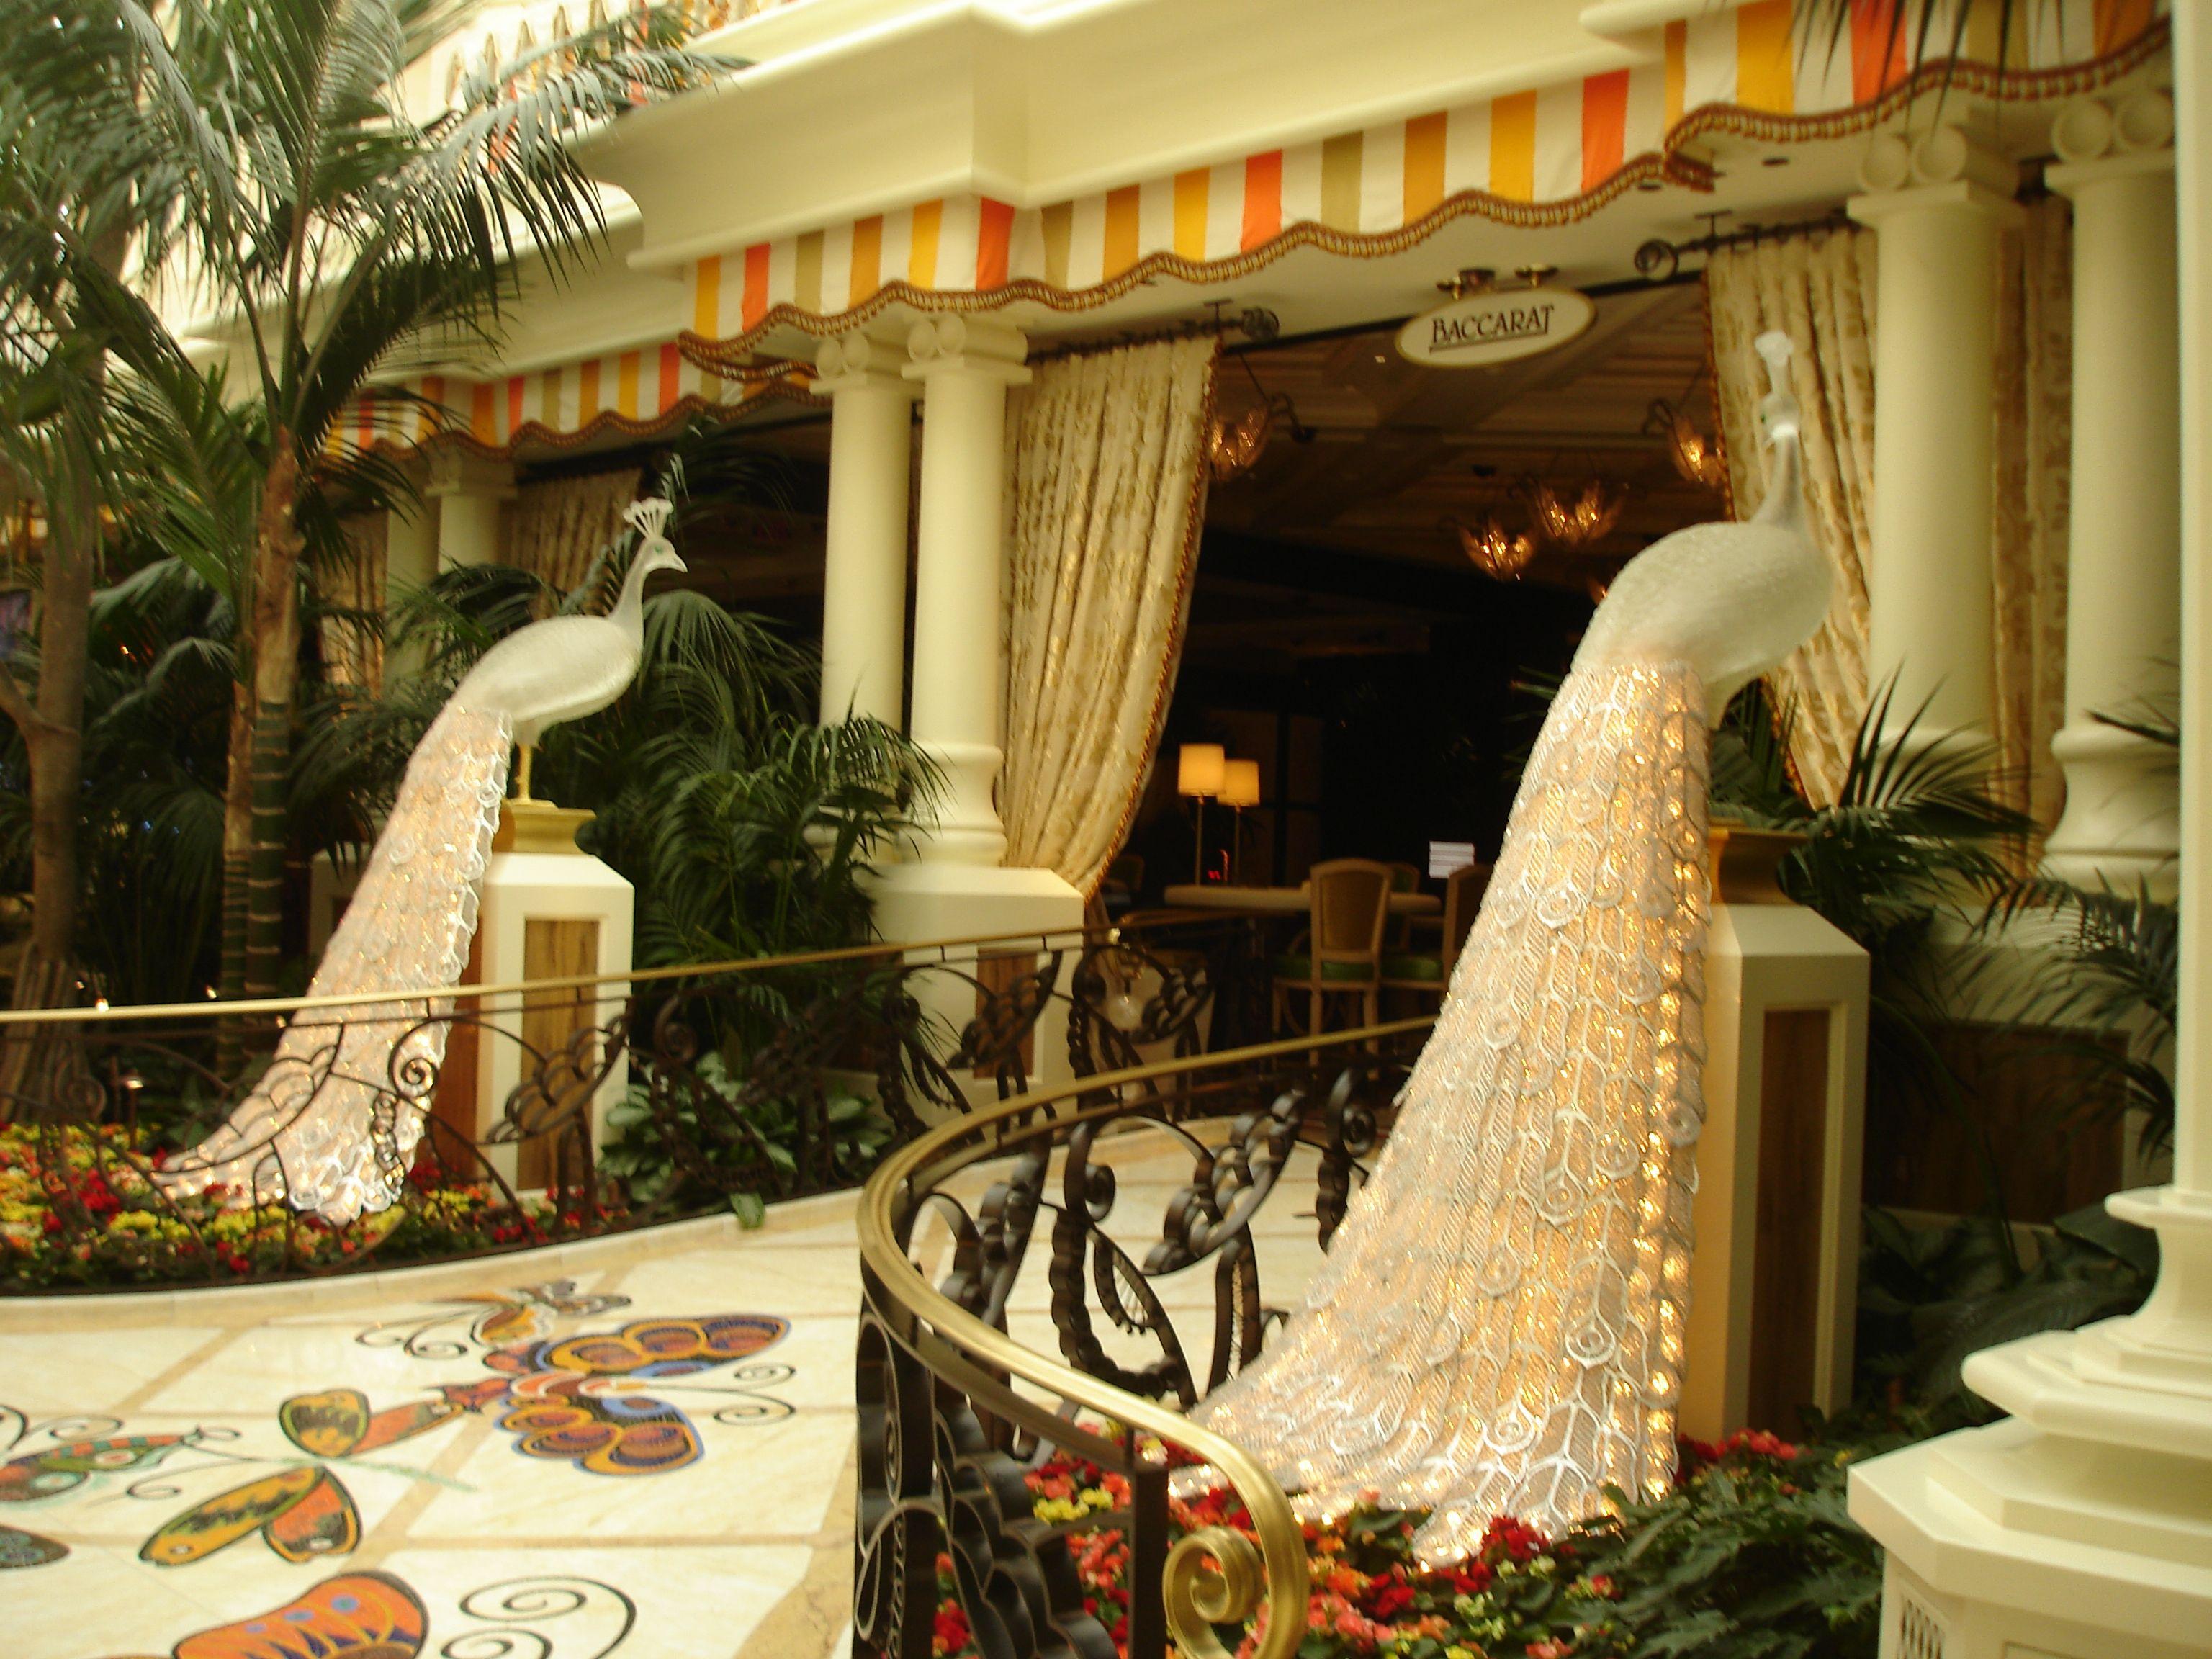 Lighted glass peacocks adorn the entrance to the restaurant. Wynn Hotel - Las Vegas